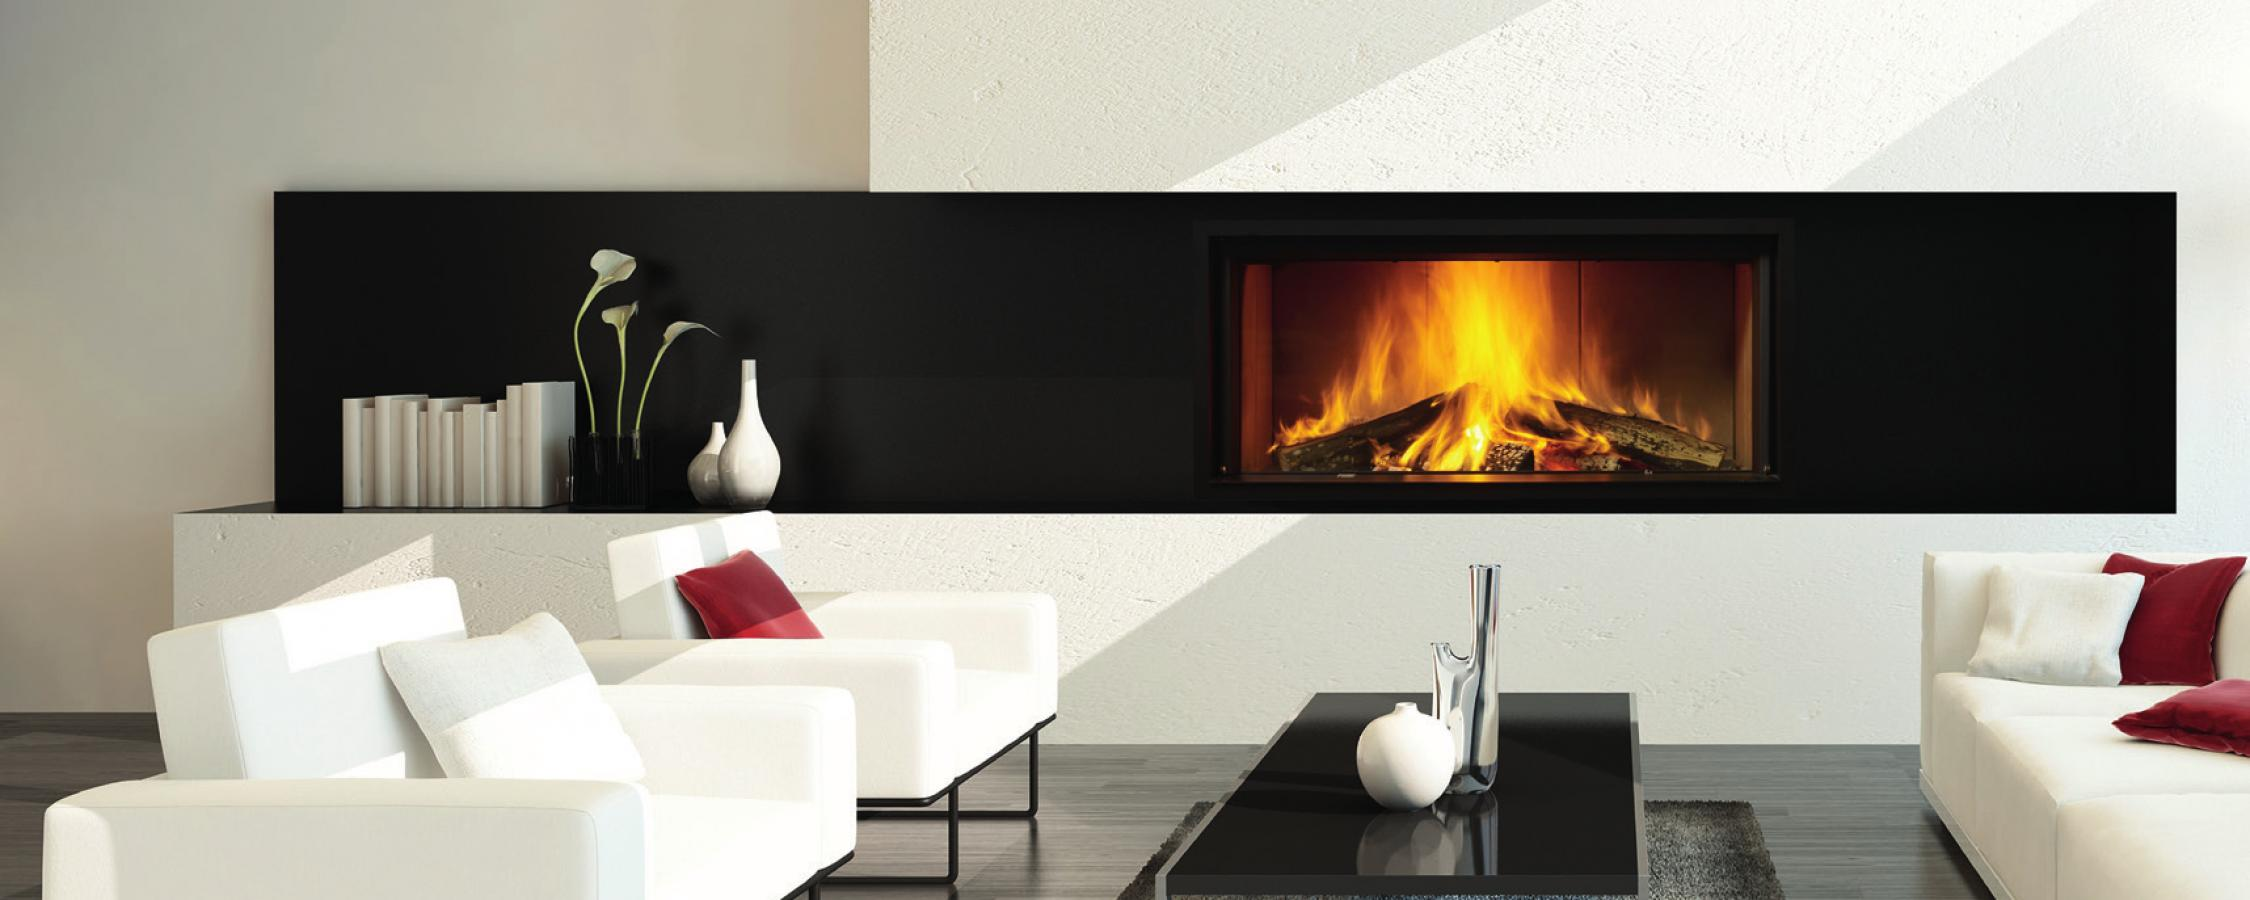 cheminee benoist. Black Bedroom Furniture Sets. Home Design Ideas